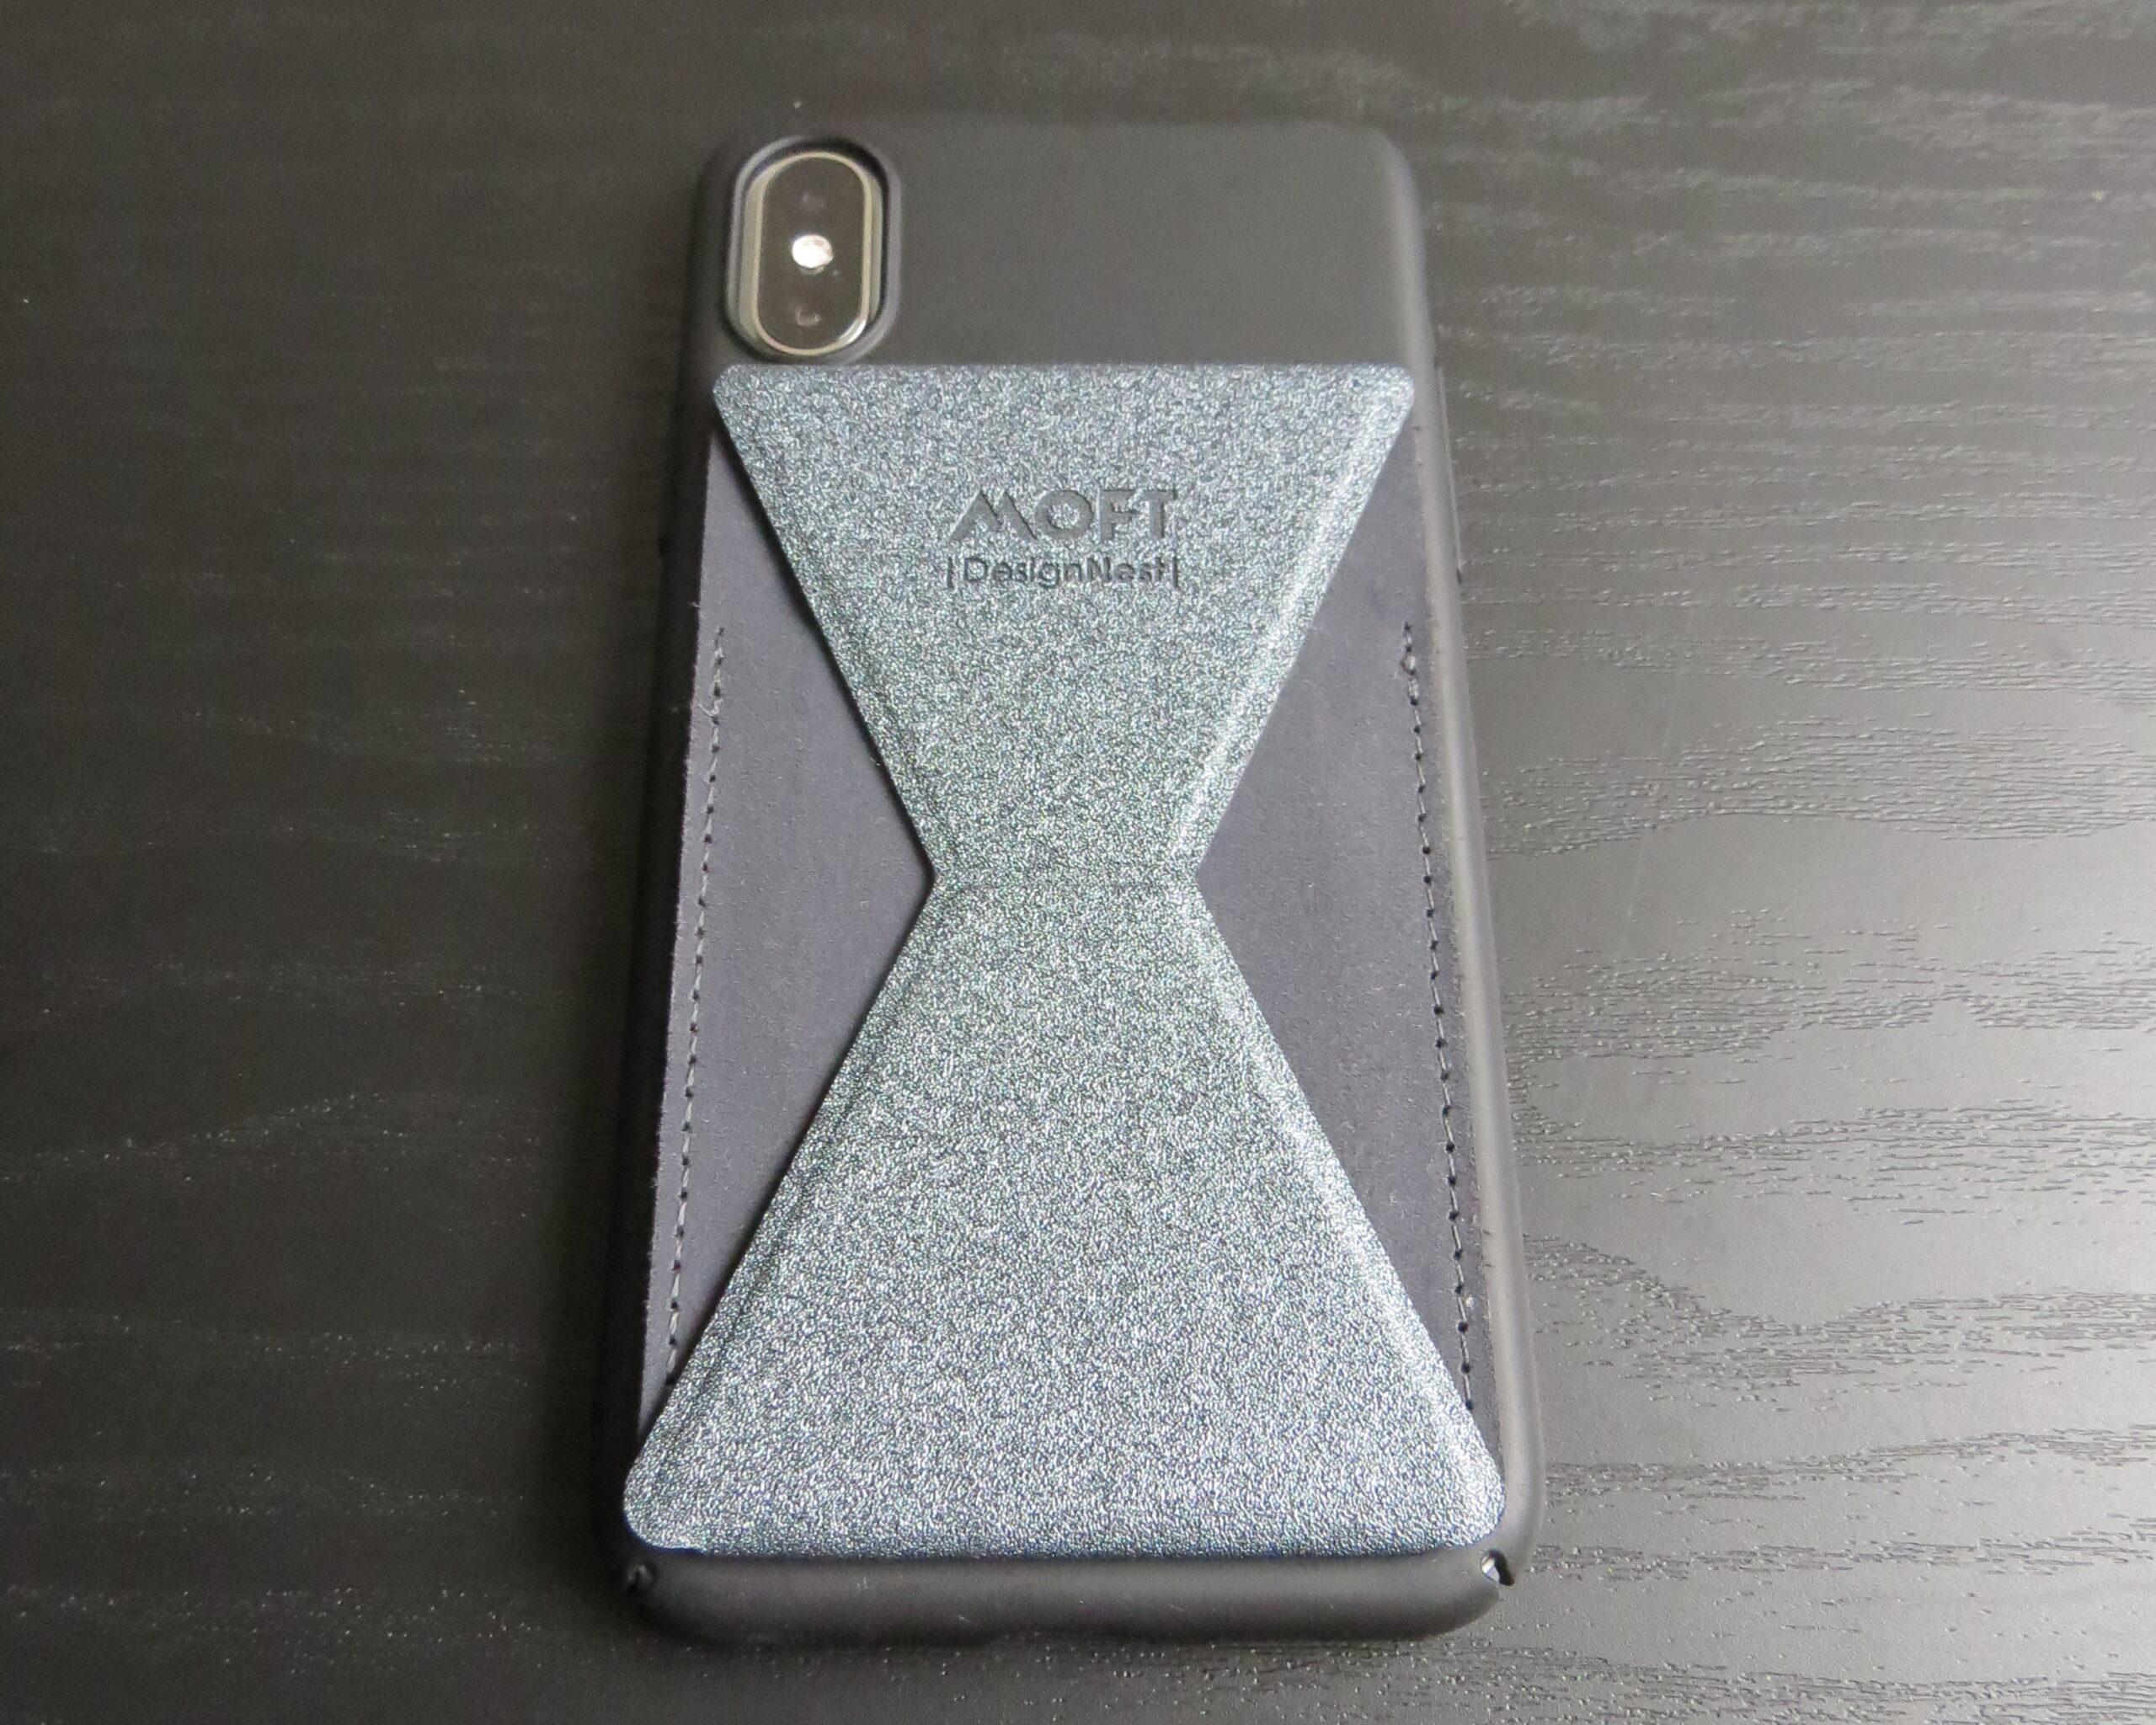 MOFT Xを貼ったiPhone